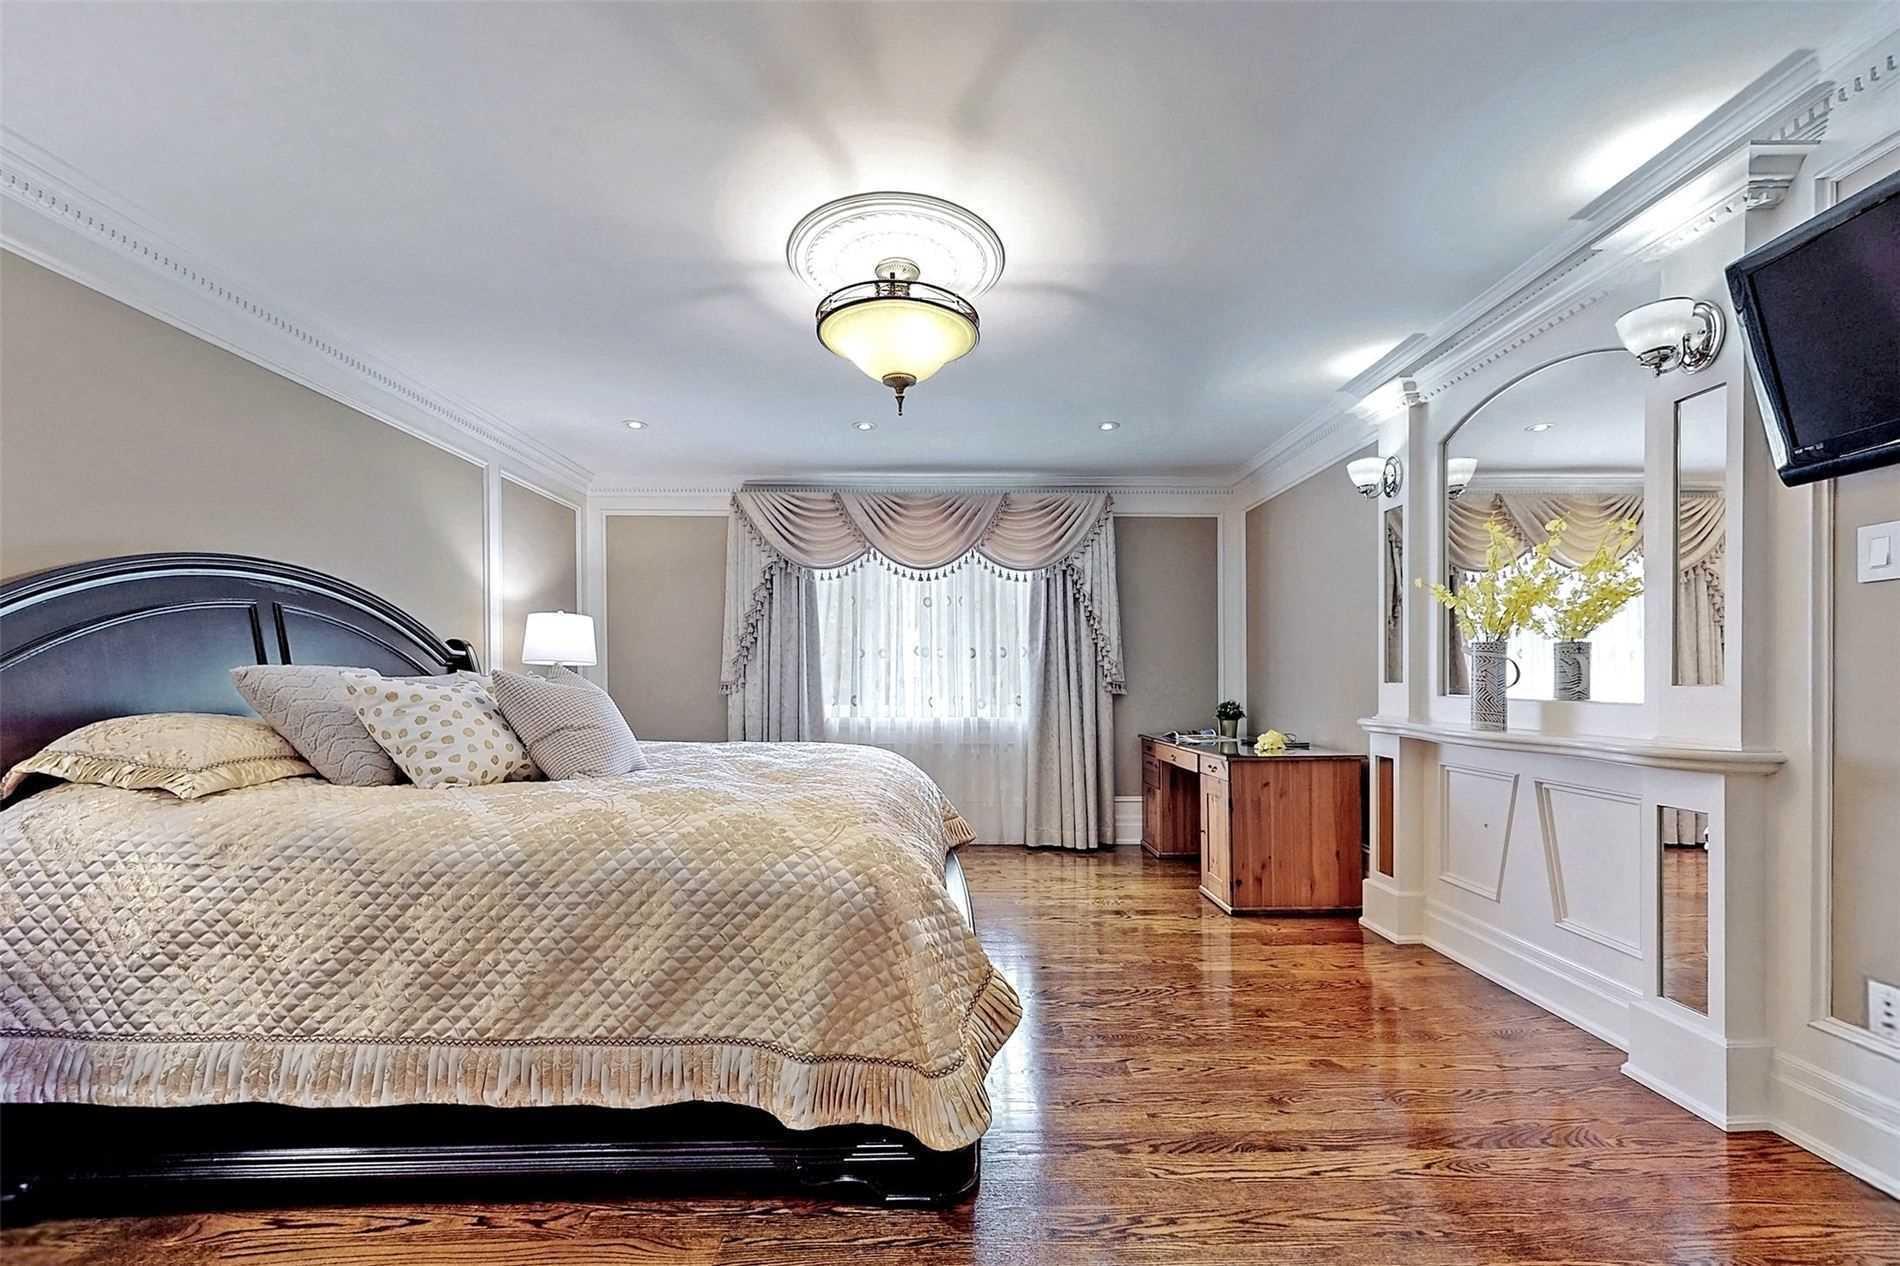 16 Kerwood Cres, Toronto, Ontario M1T2S2, 3 Bedrooms Bedrooms, 7 Rooms Rooms,5 BathroomsBathrooms,Detached,For Sale,Kerwood,E5304612